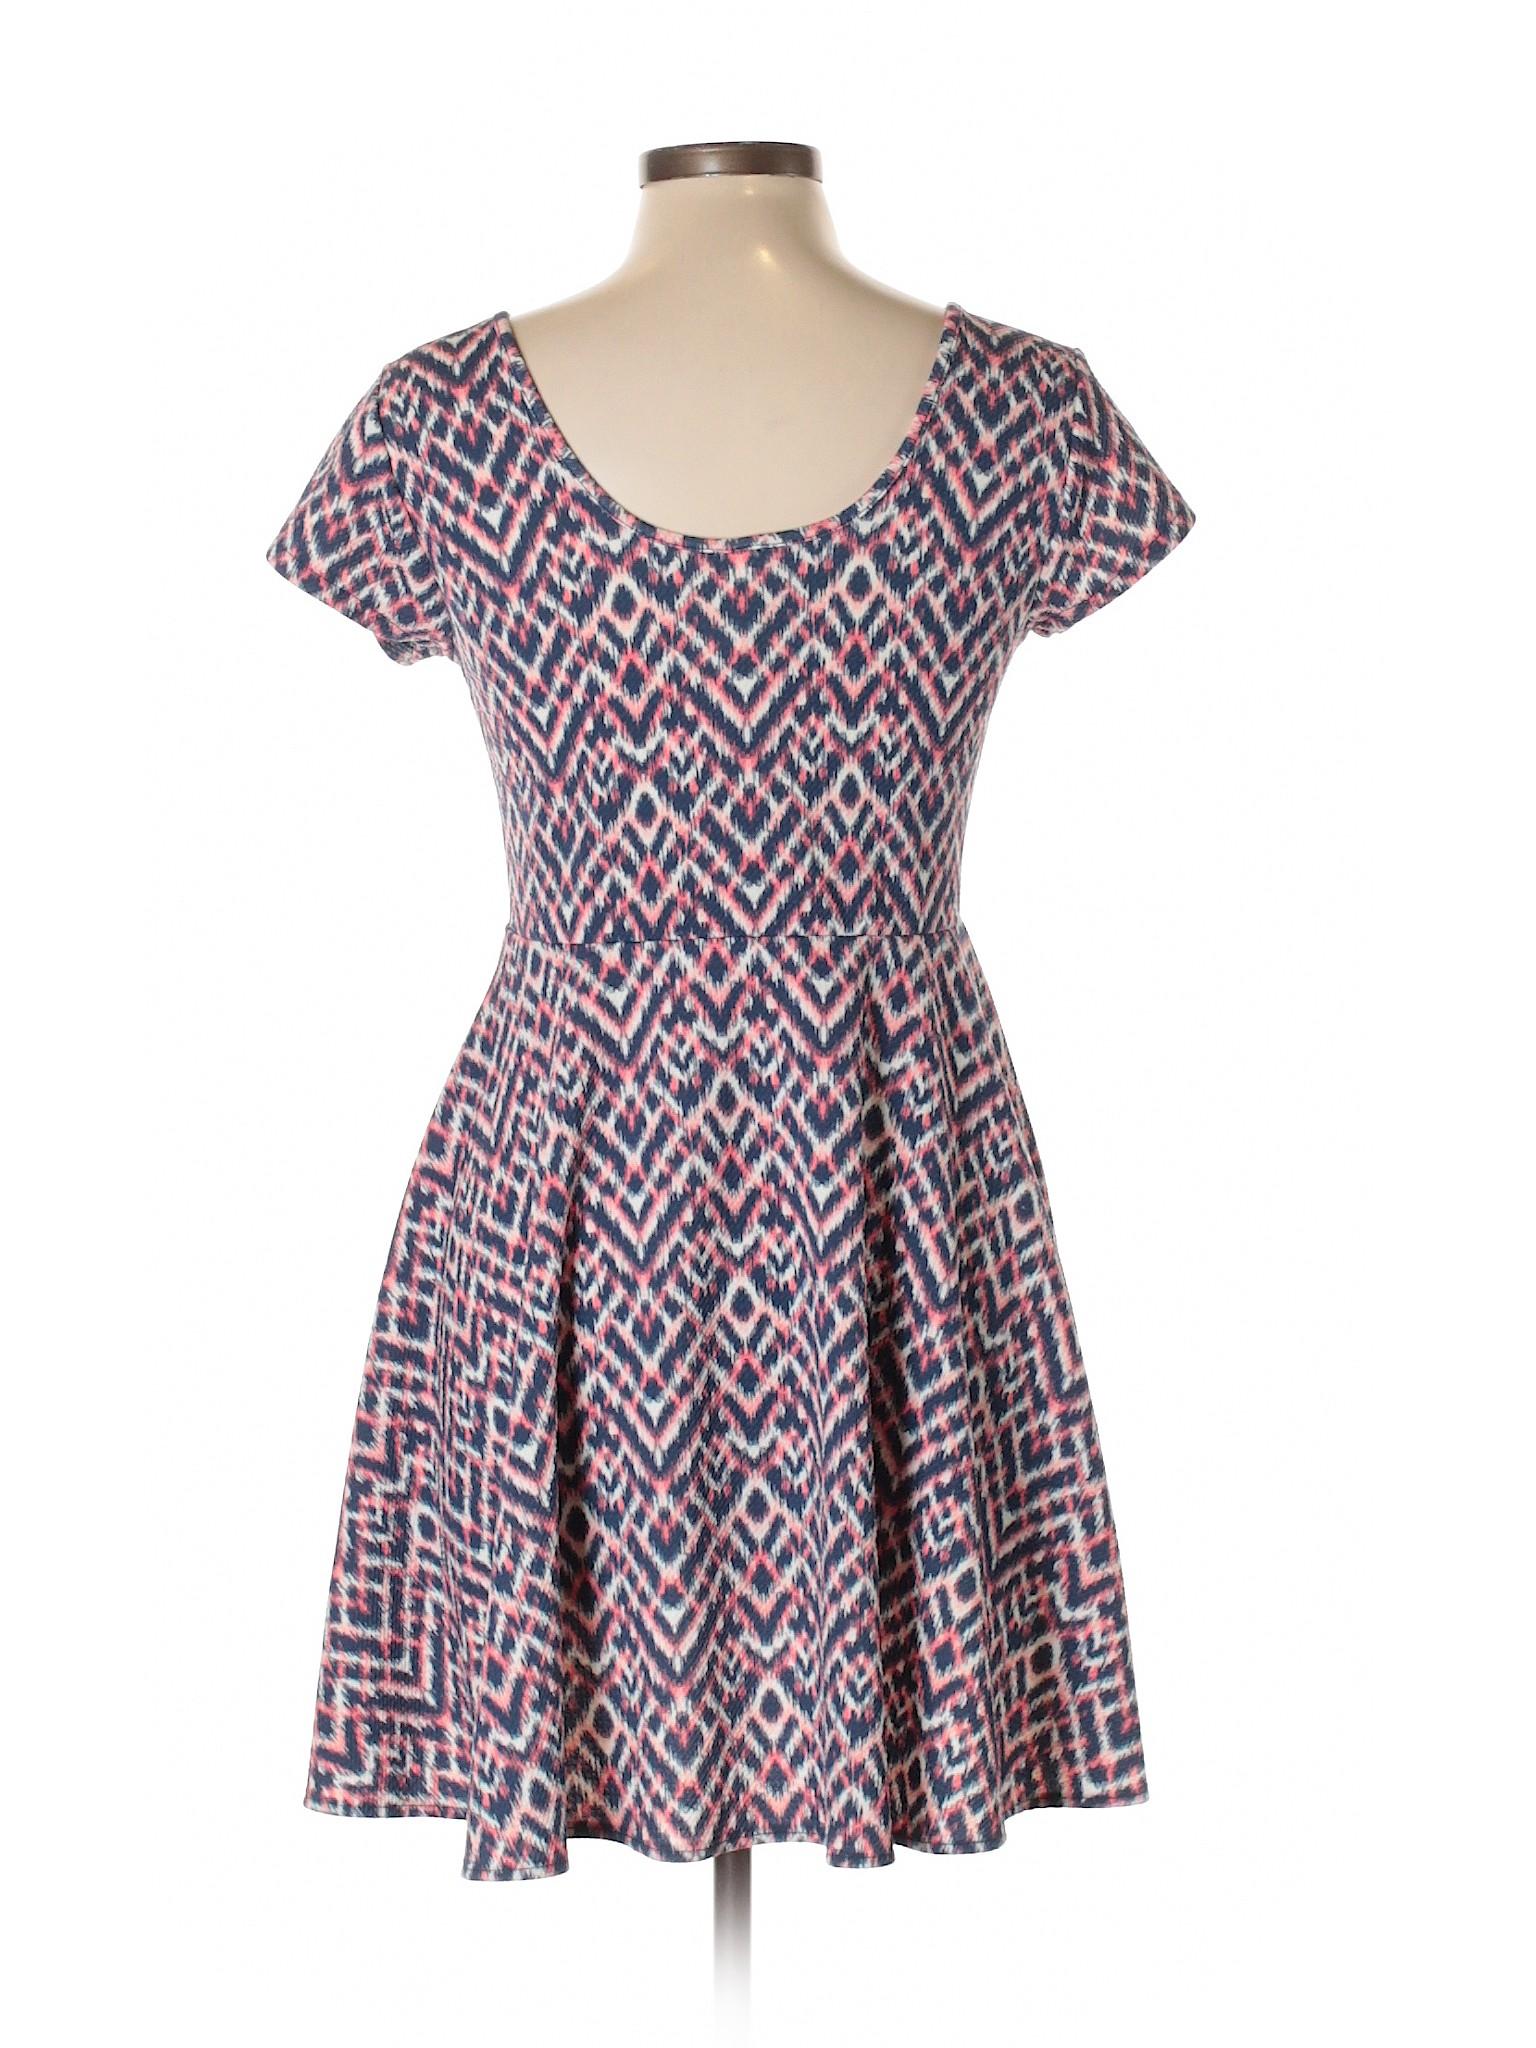 Casual Selling Selling Aeropostale Casual Dress Dress Aeropostale x7FFvXq